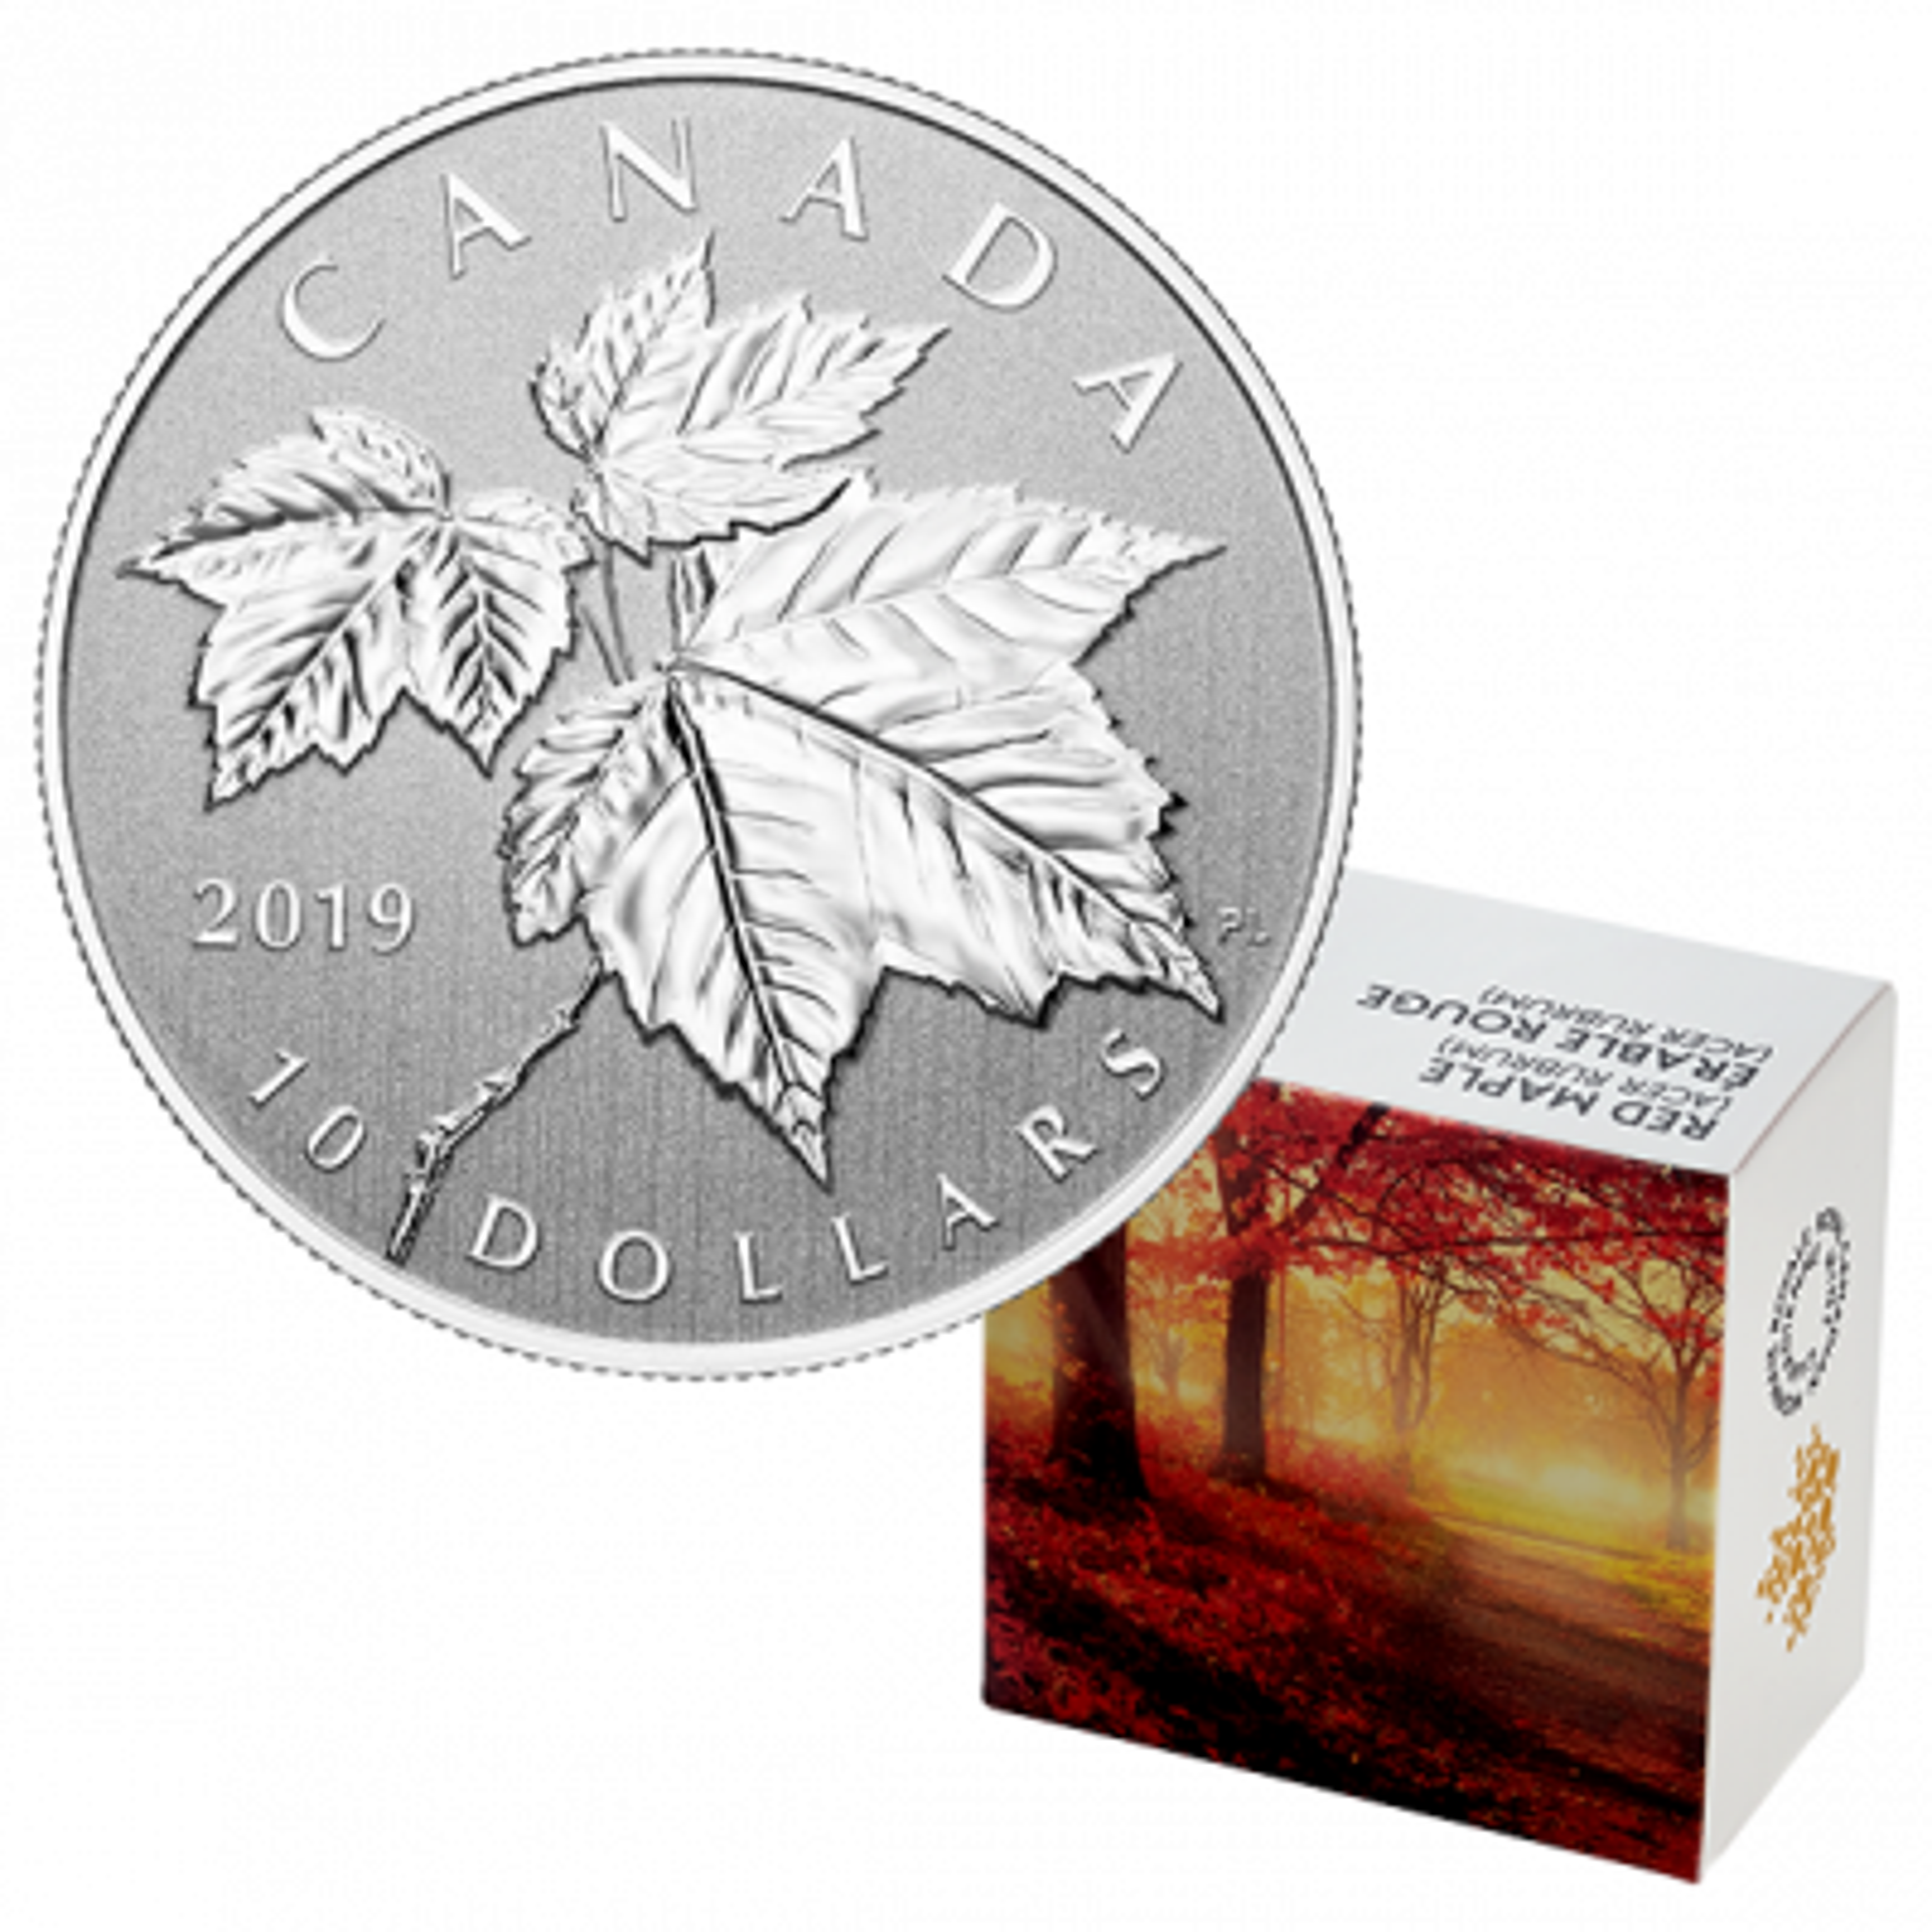 1/2 Troy ounce silver coin Maple Leaf 2019